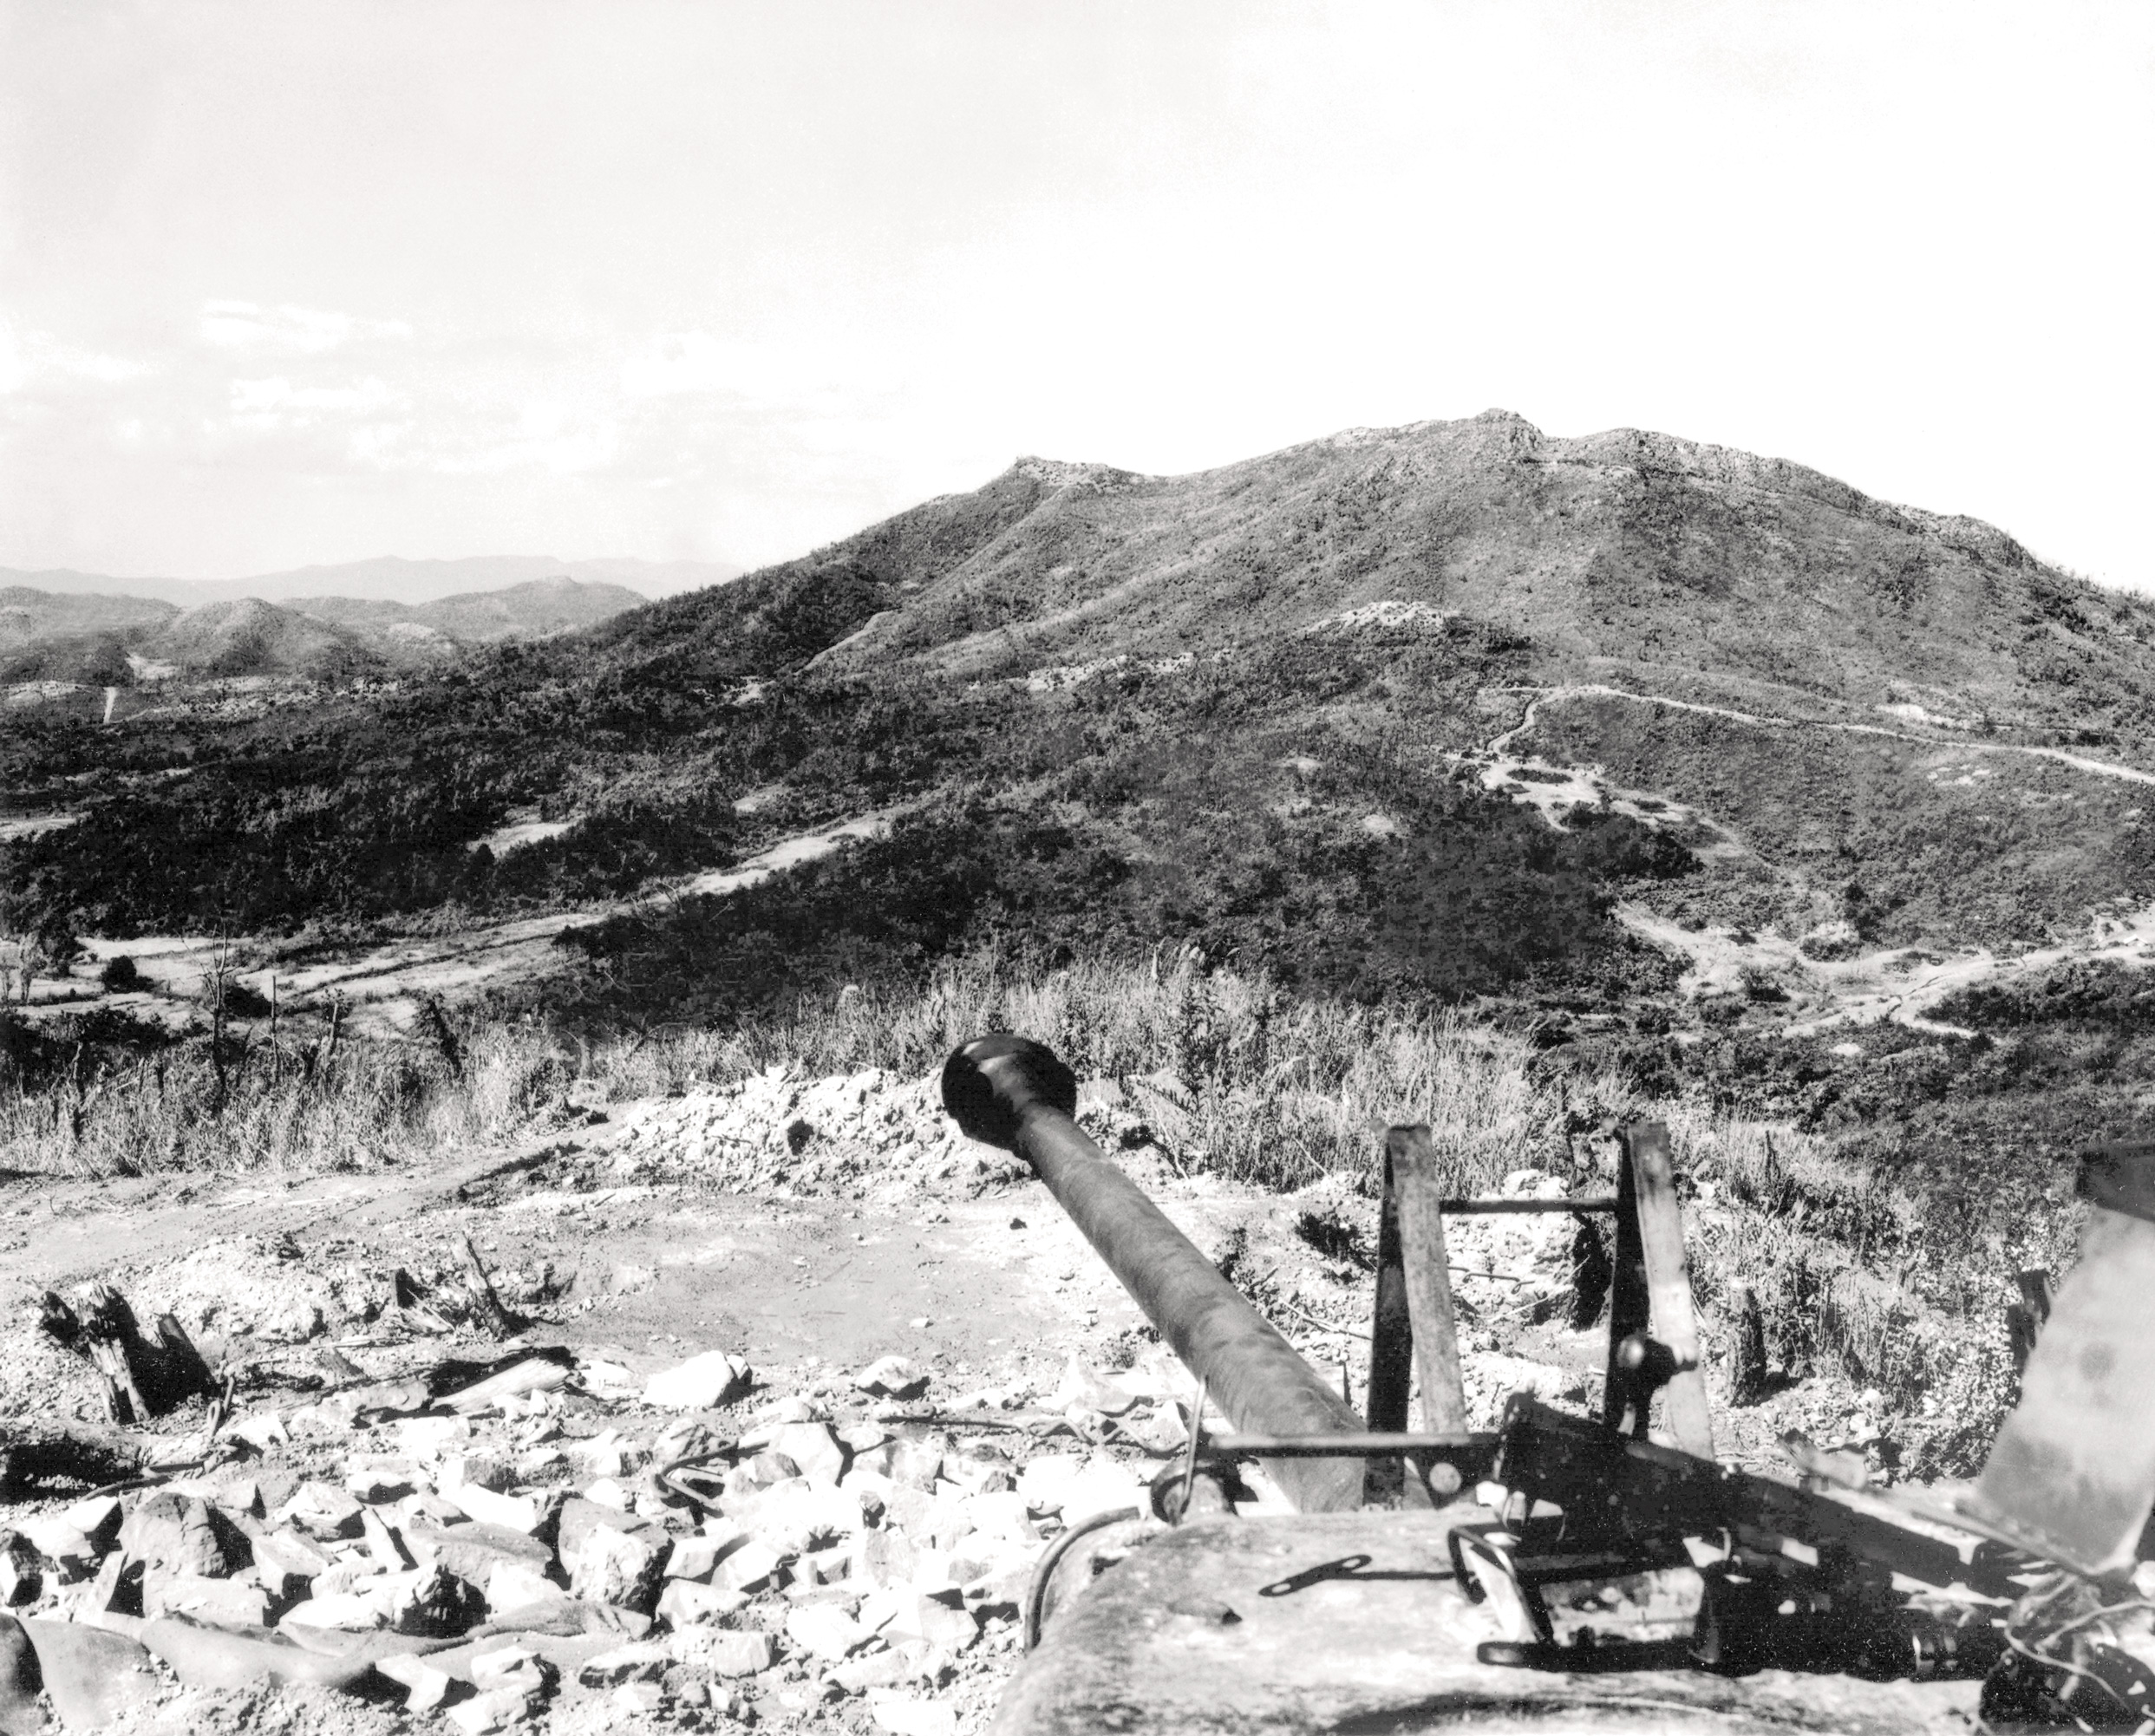 Historic Korean War Photo – Korean Landscape